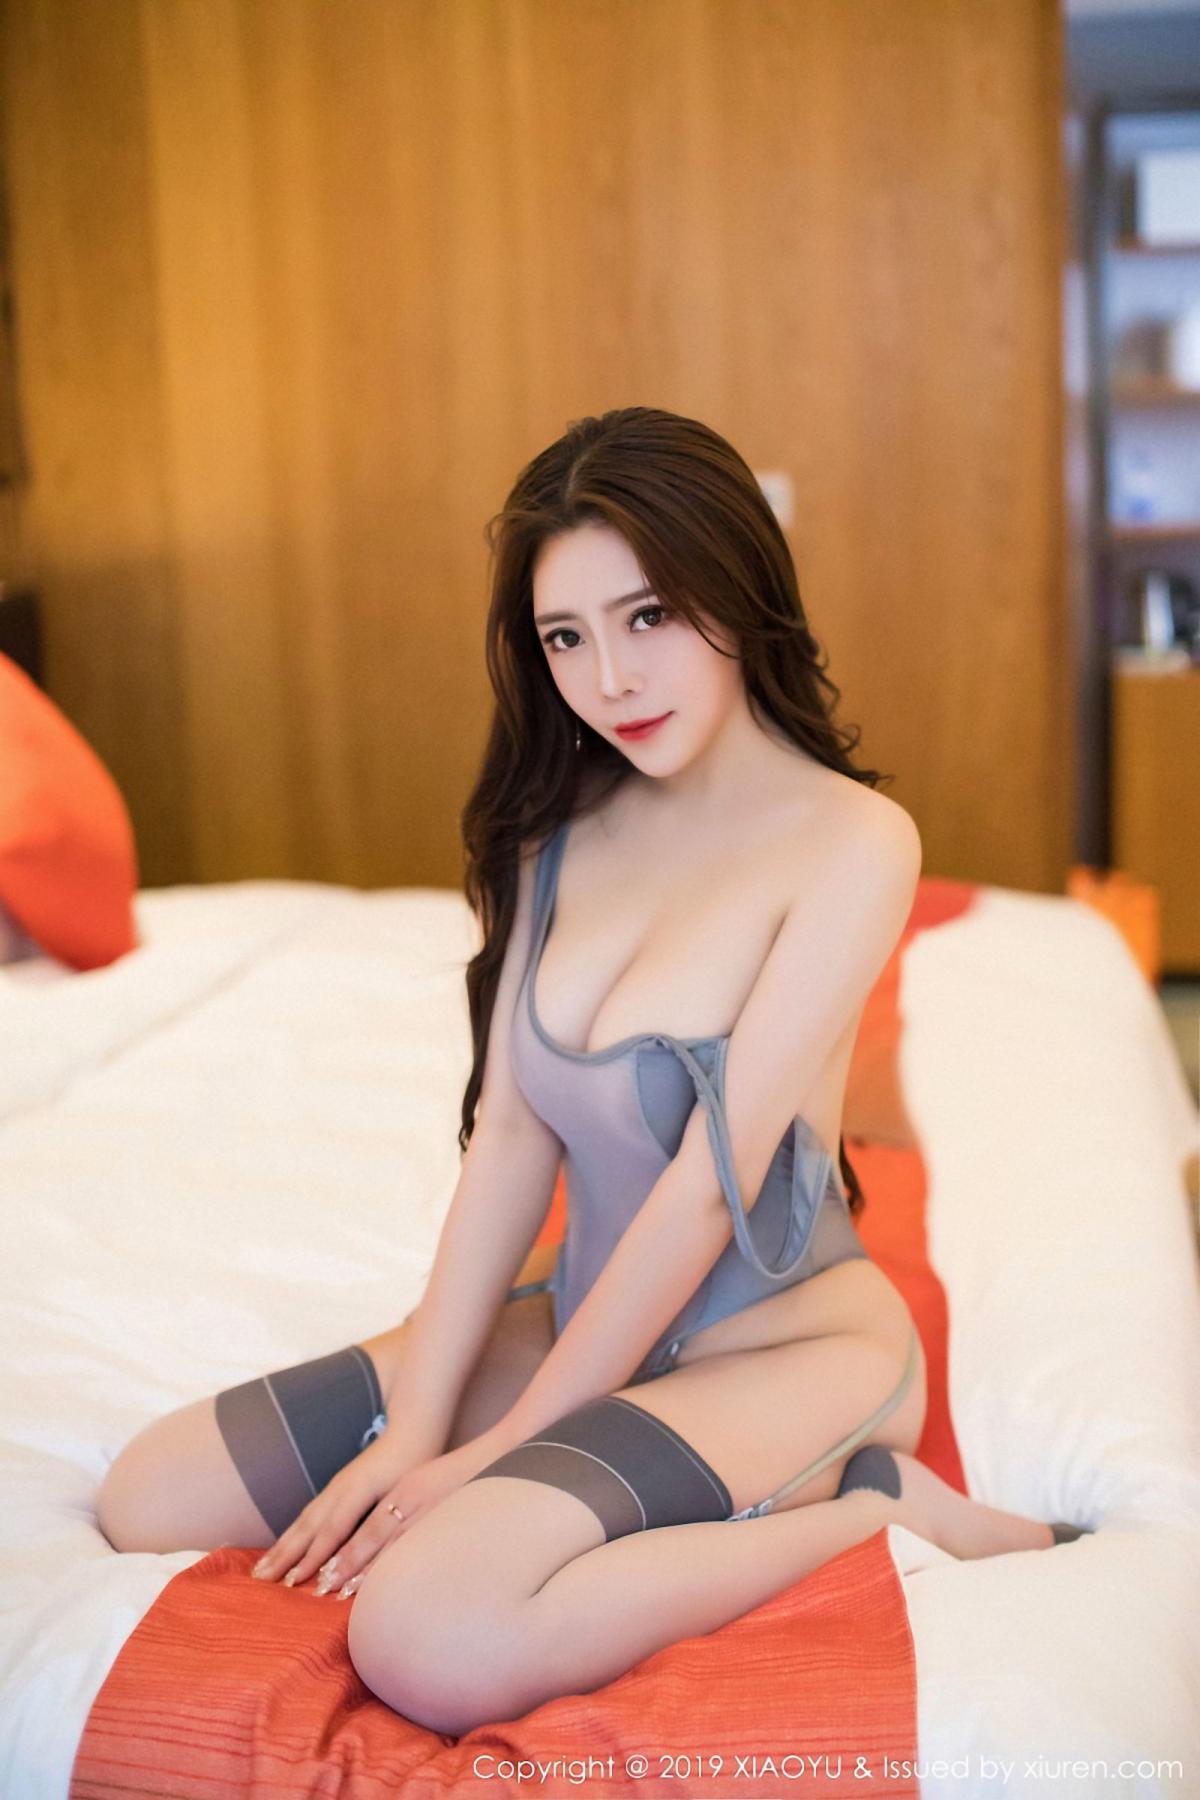 [XiaoYu] Vol.038 Miki Tu 42P, Miki Tu, XiaoYu